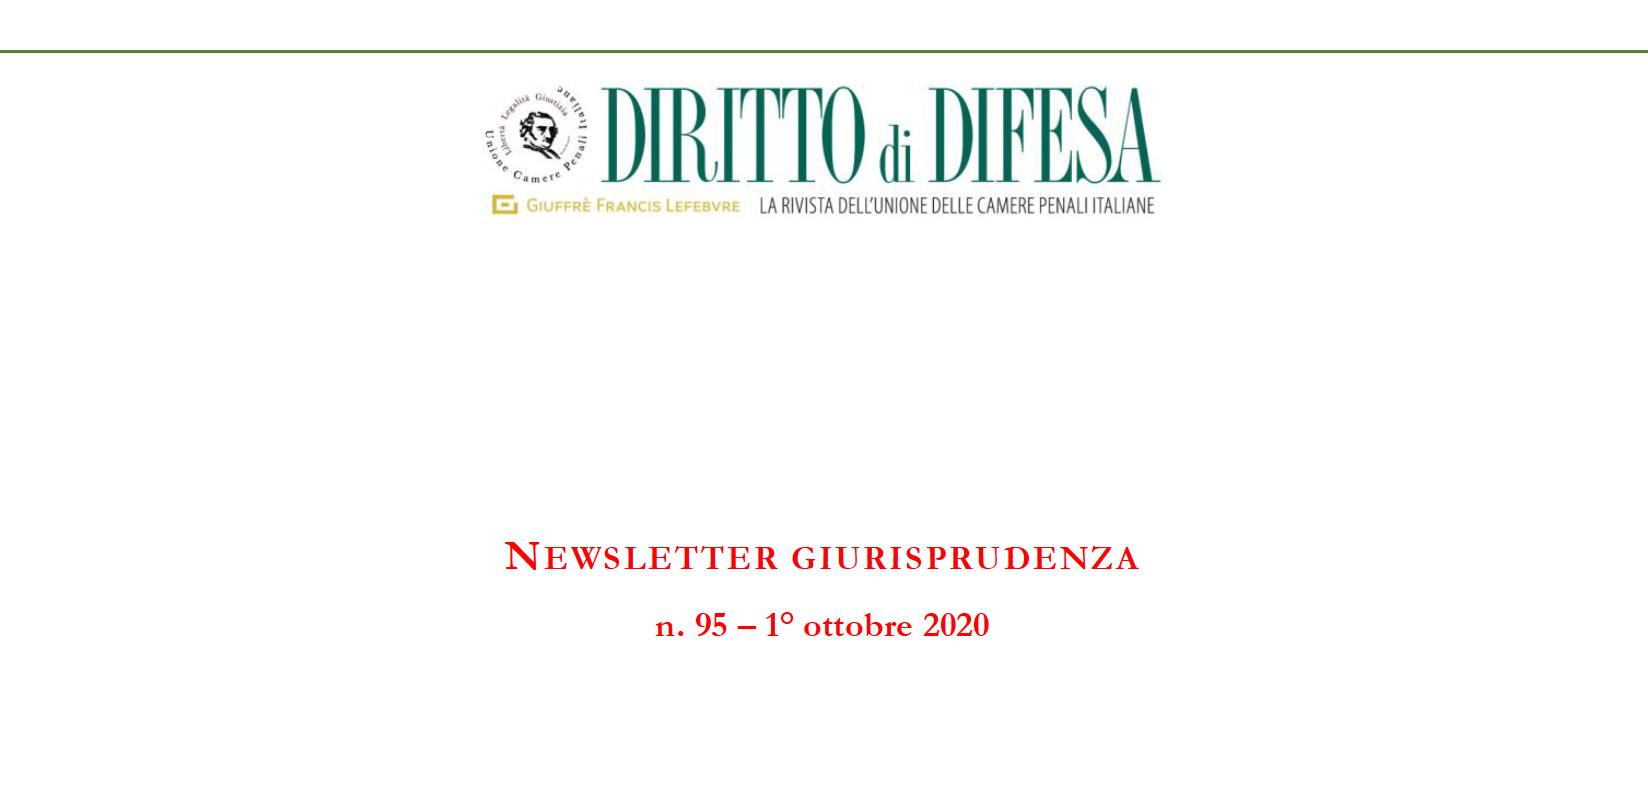 NEWSLETTER GIURISPRUDENZA N. 95 – 1° OTTOBRE 2020